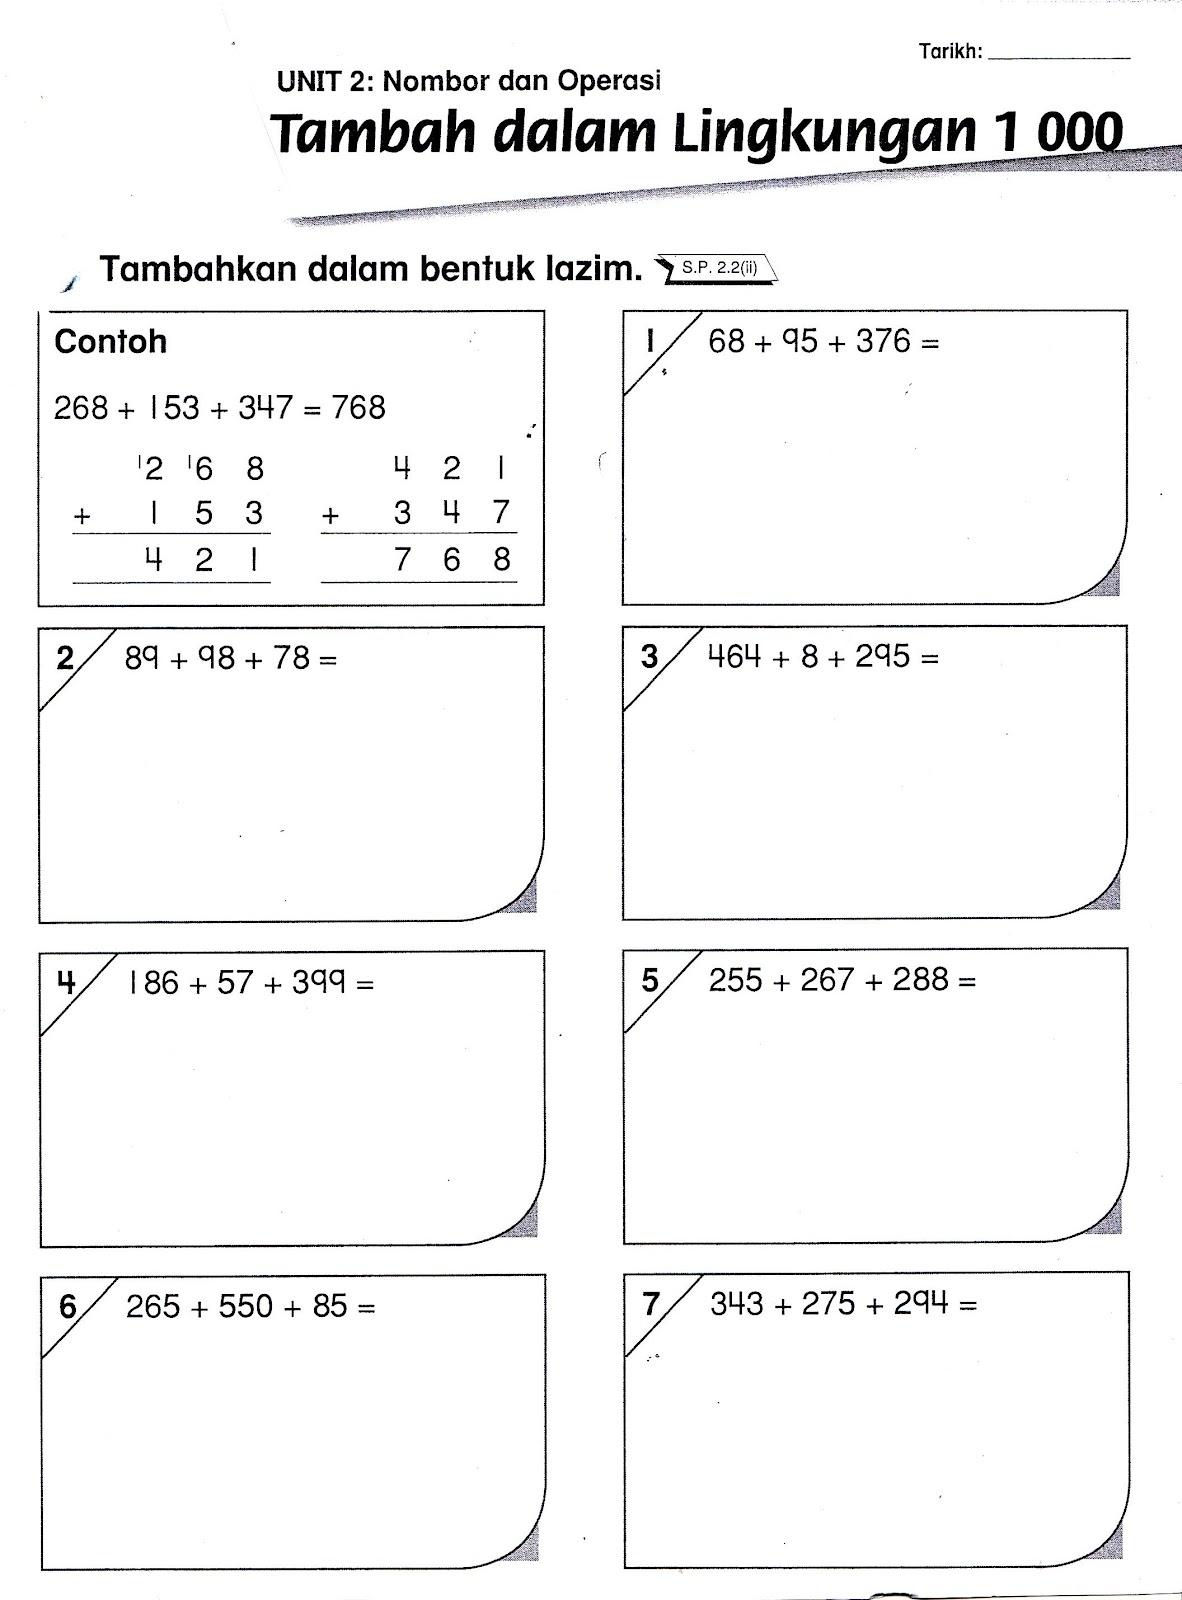 Sudut Matematik Lembaran Kerja 3 Operasi Tambah